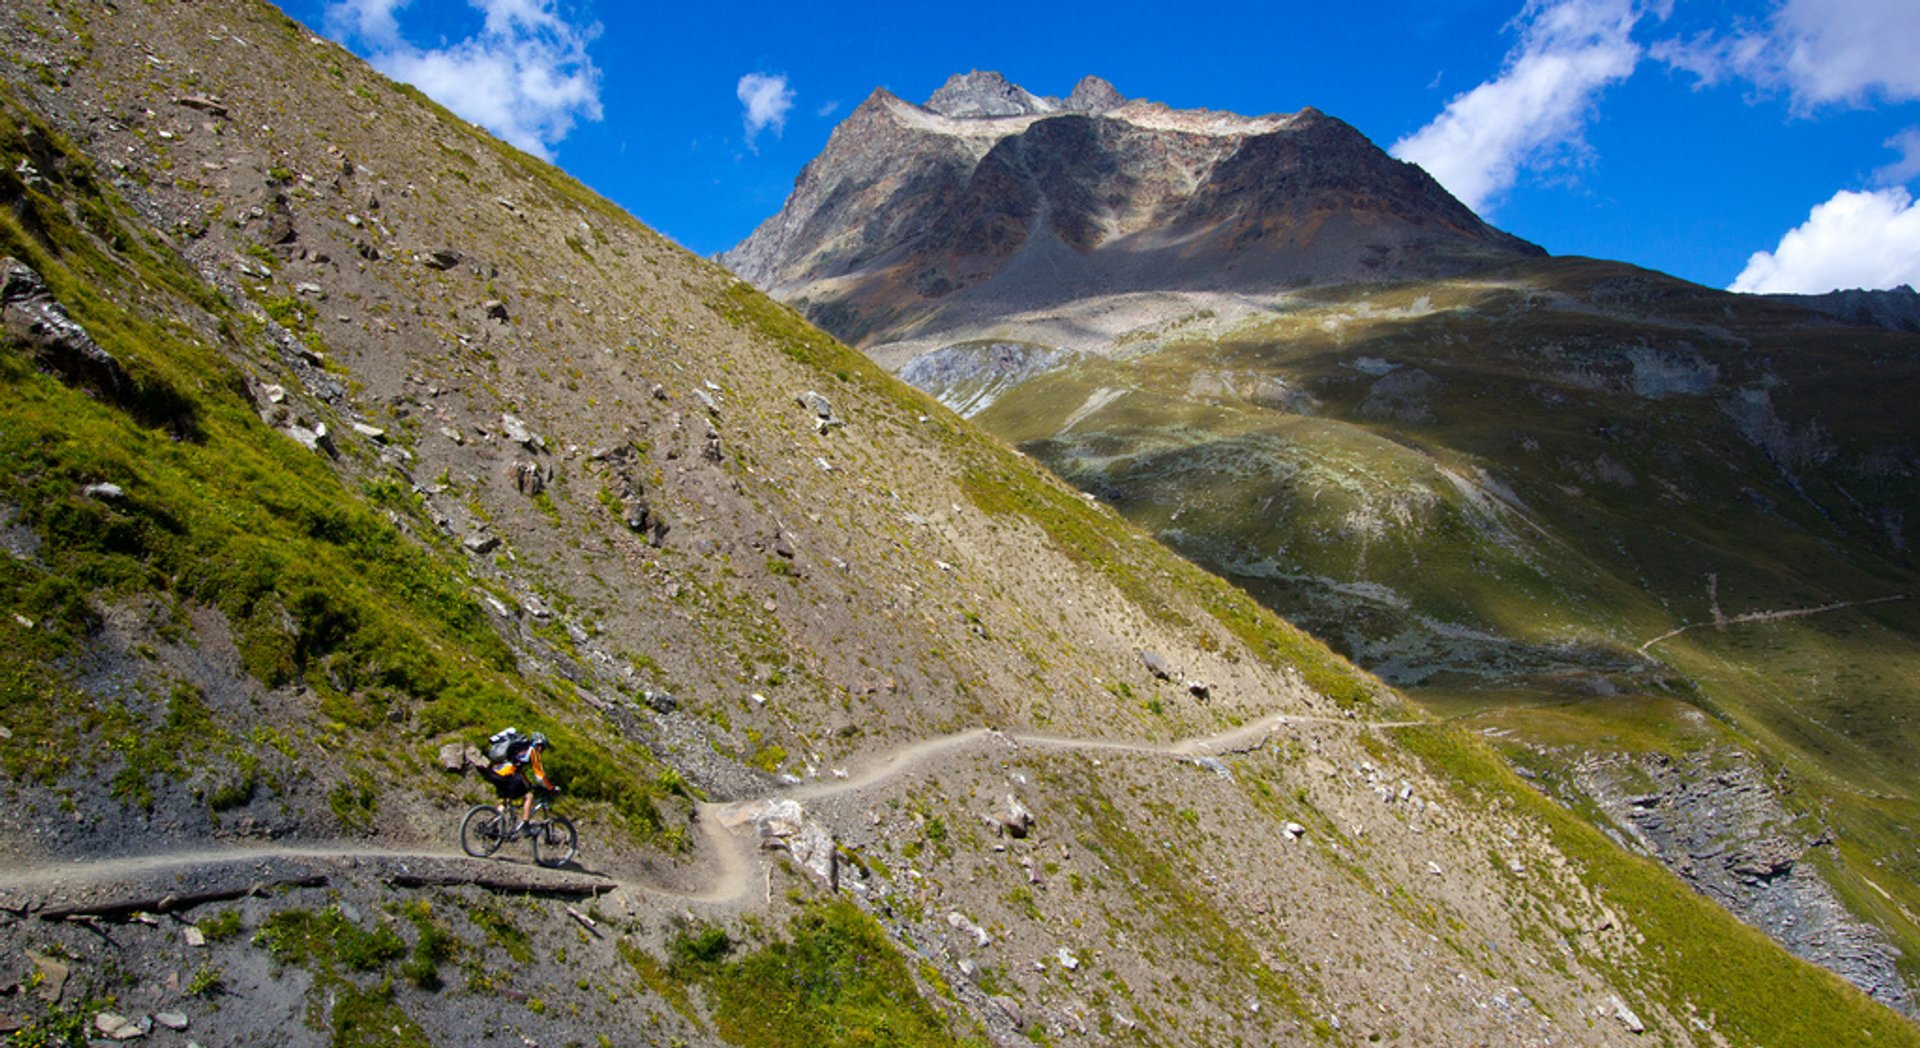 Singletrail, La Punt-Chamues-ch, Canton of Graubunden, Switzerland 2019